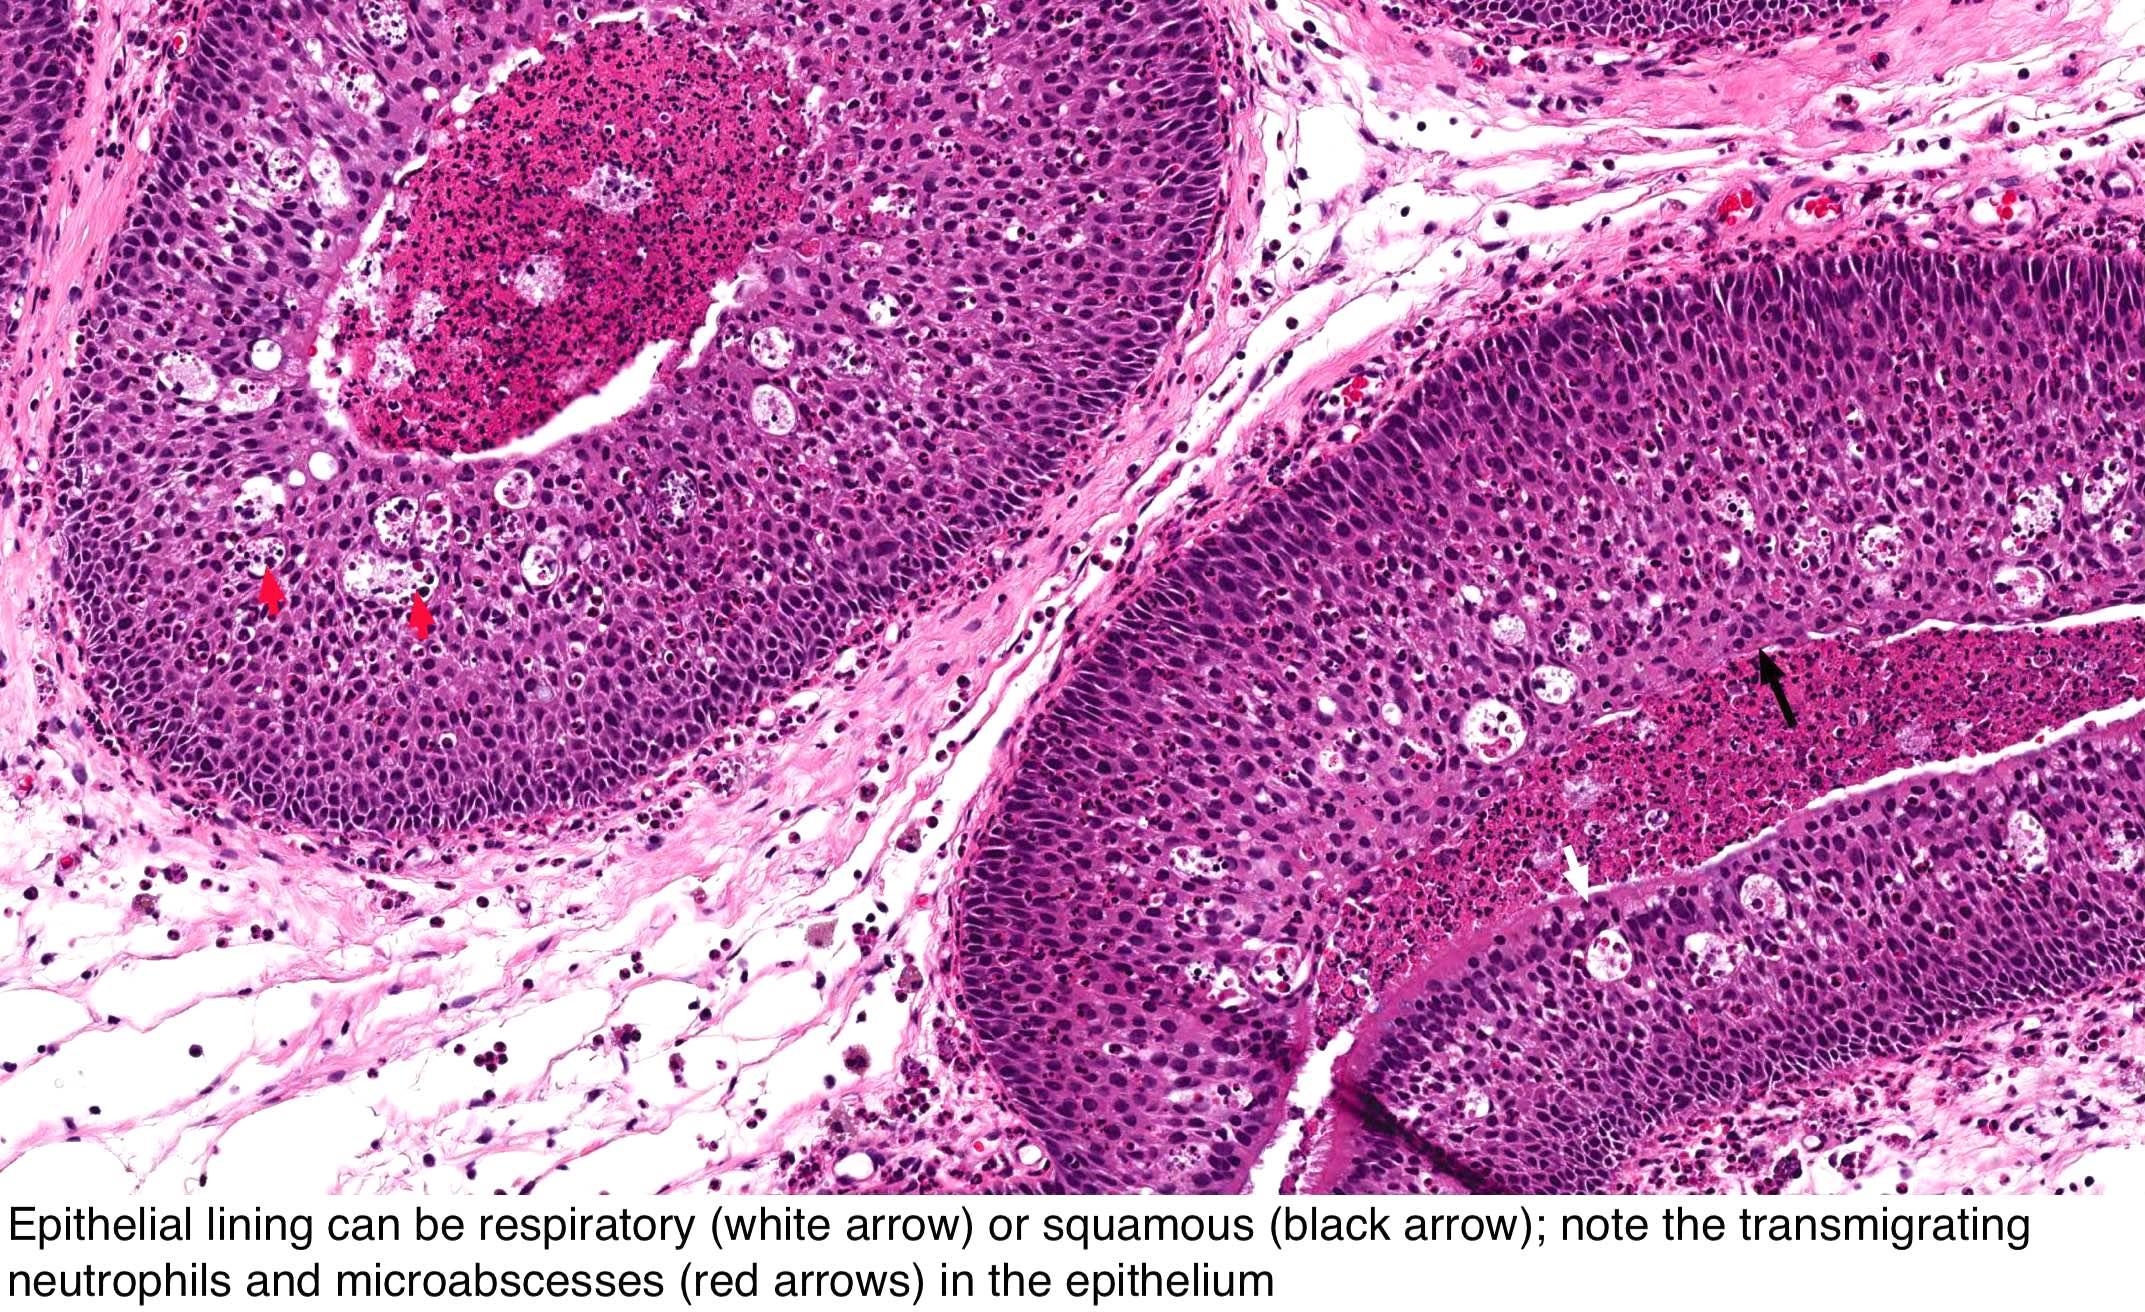 zodia cancerului rezumat tpu genital warts condyloma acuminata)